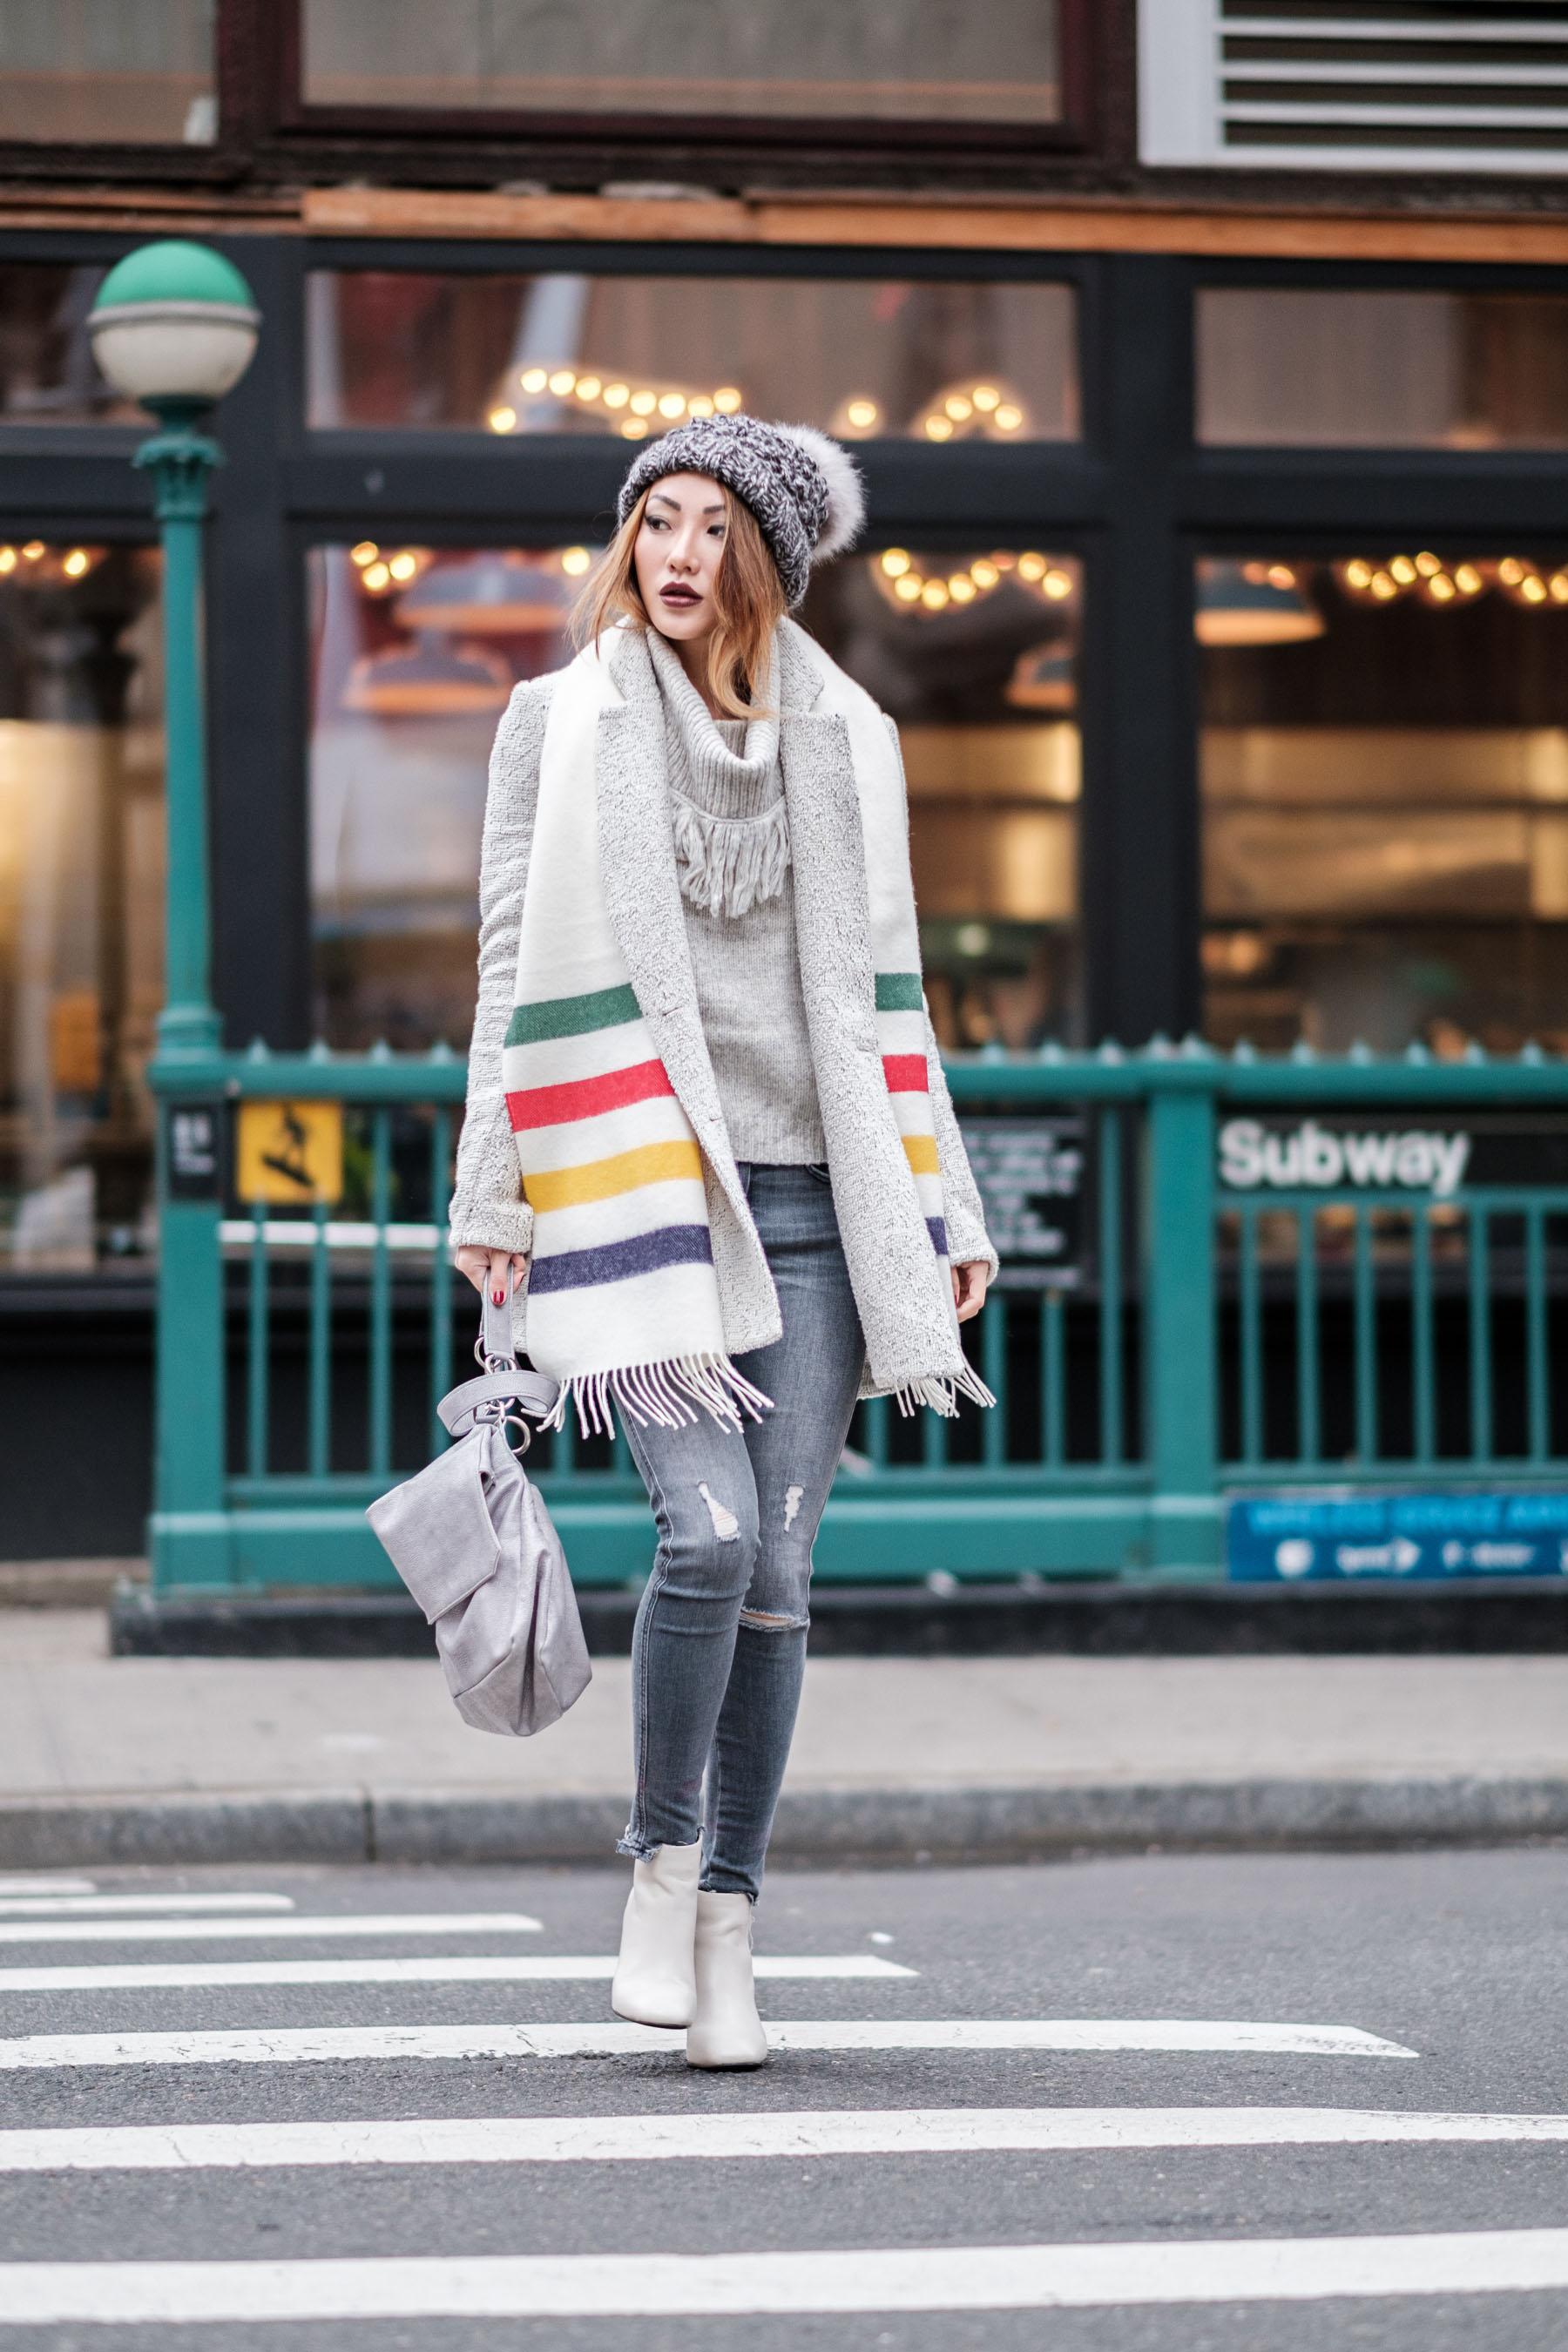 monochrome-gray-outfit-stripe-fringe-scarf-cowl-neck-sweater-gray-denim-white-boots-notjessfashion-900x1350@2x